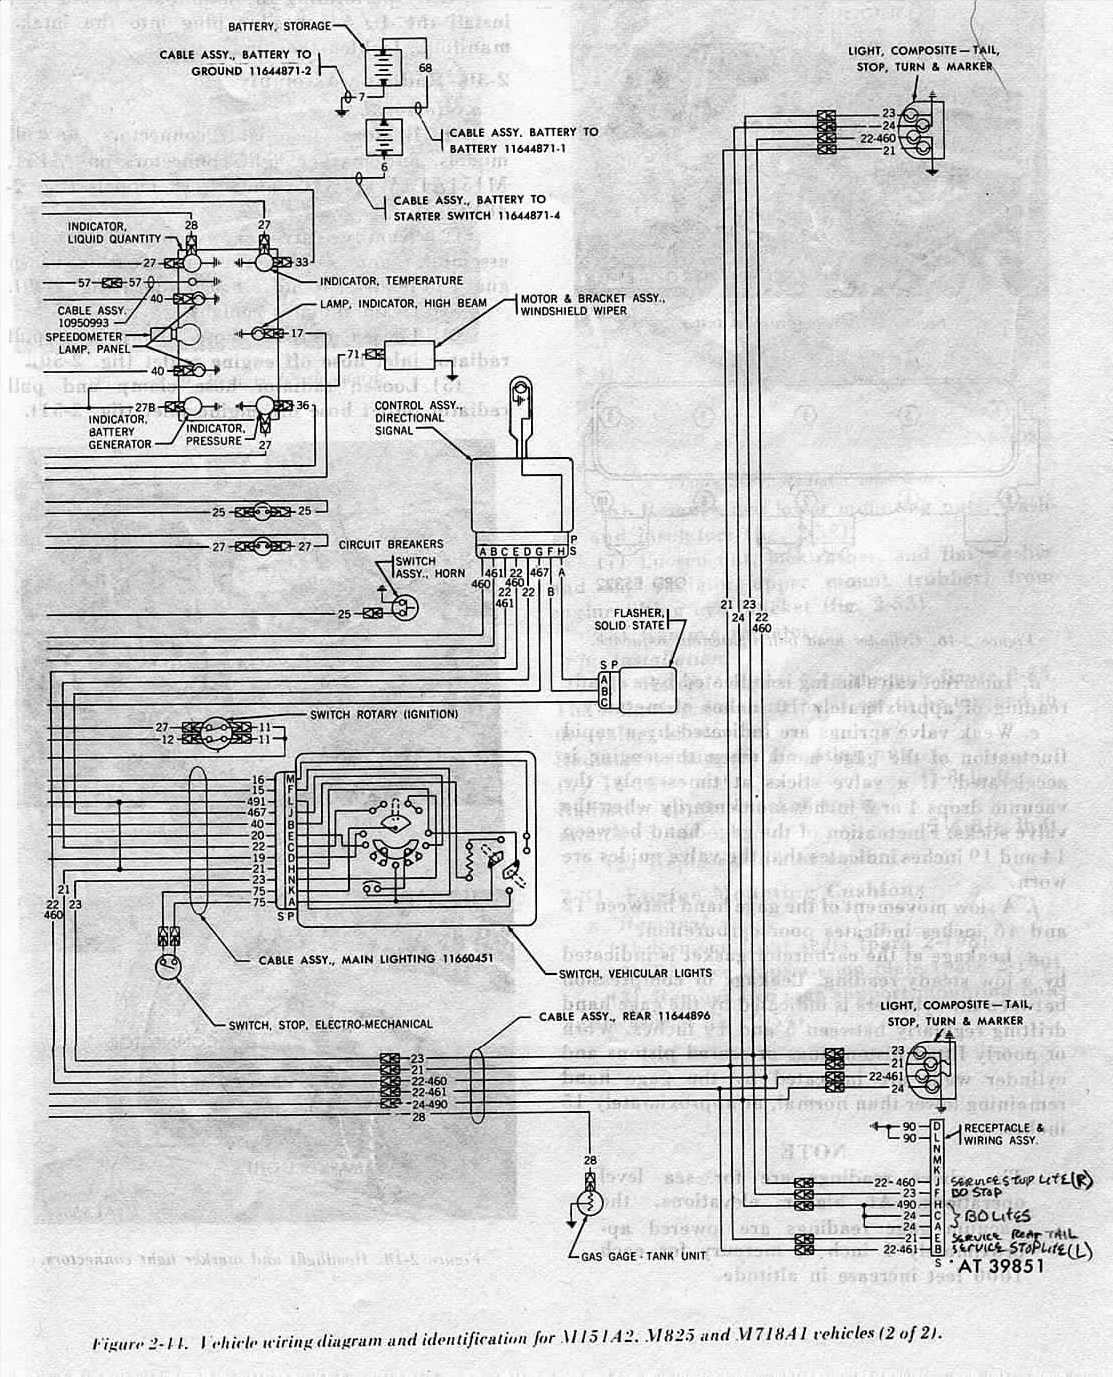 M151a2 Wiring Diagram - On Wiring Diagram on m38 wiring diagram, m38a1 wiring diagram, m151a1 wiring diagram, m813 wiring diagram, m37 wiring diagram, m715 wiring diagram, fuel sender wiring diagram, truck wiring diagram, m151 wiring diagram, mutt wiring diagram, gpw wiring diagram, sterling wiring diagram, hummer wiring diagram, jeep wiring diagram, 4x4 wiring diagram, ambulance wiring diagram, willys wiring diagram, m998 wiring diagram, m35a2 wiring diagram, humvee wiring diagram,